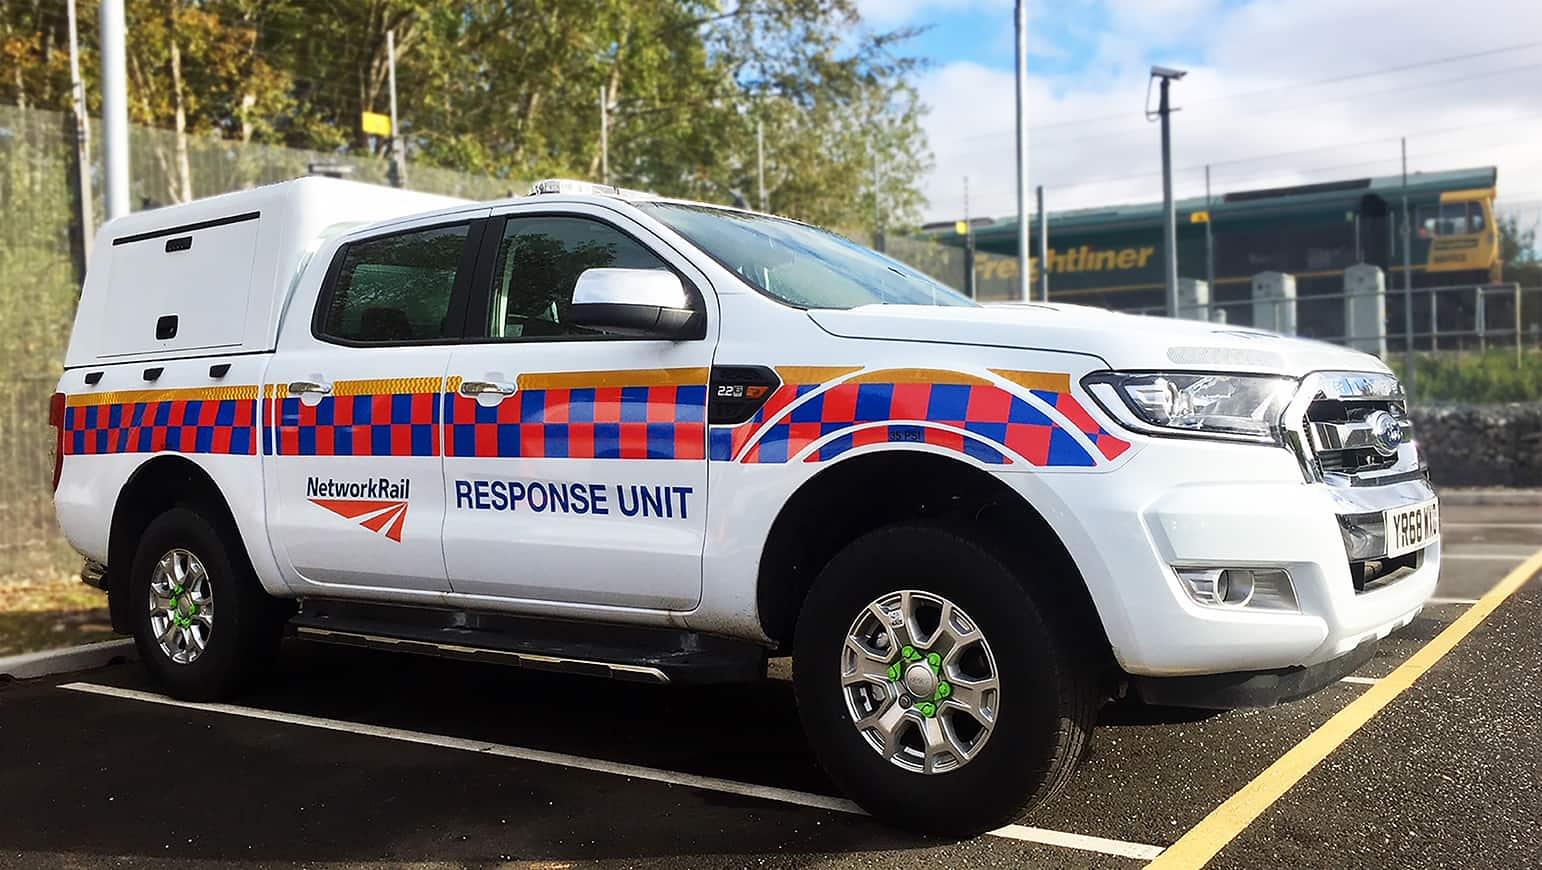 Network Rail Rapid response